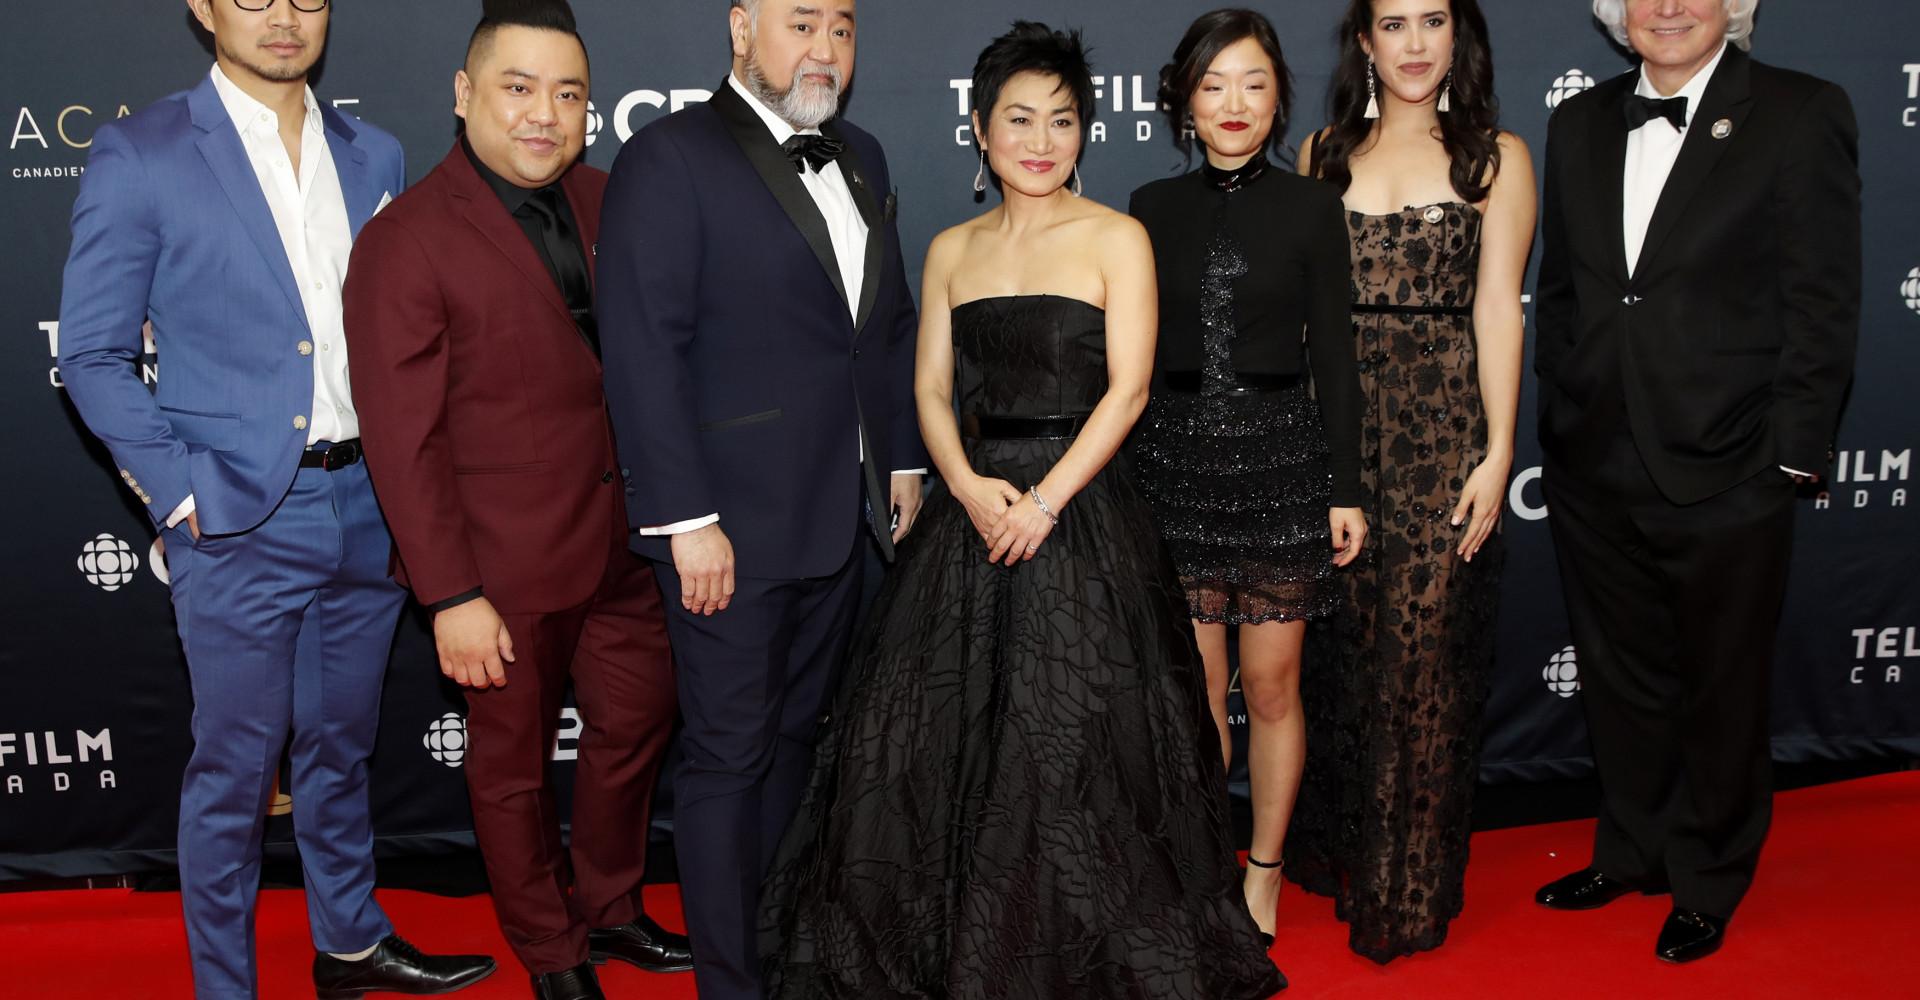 Stars react to season 3 renewal for 'Kim's Convenience'